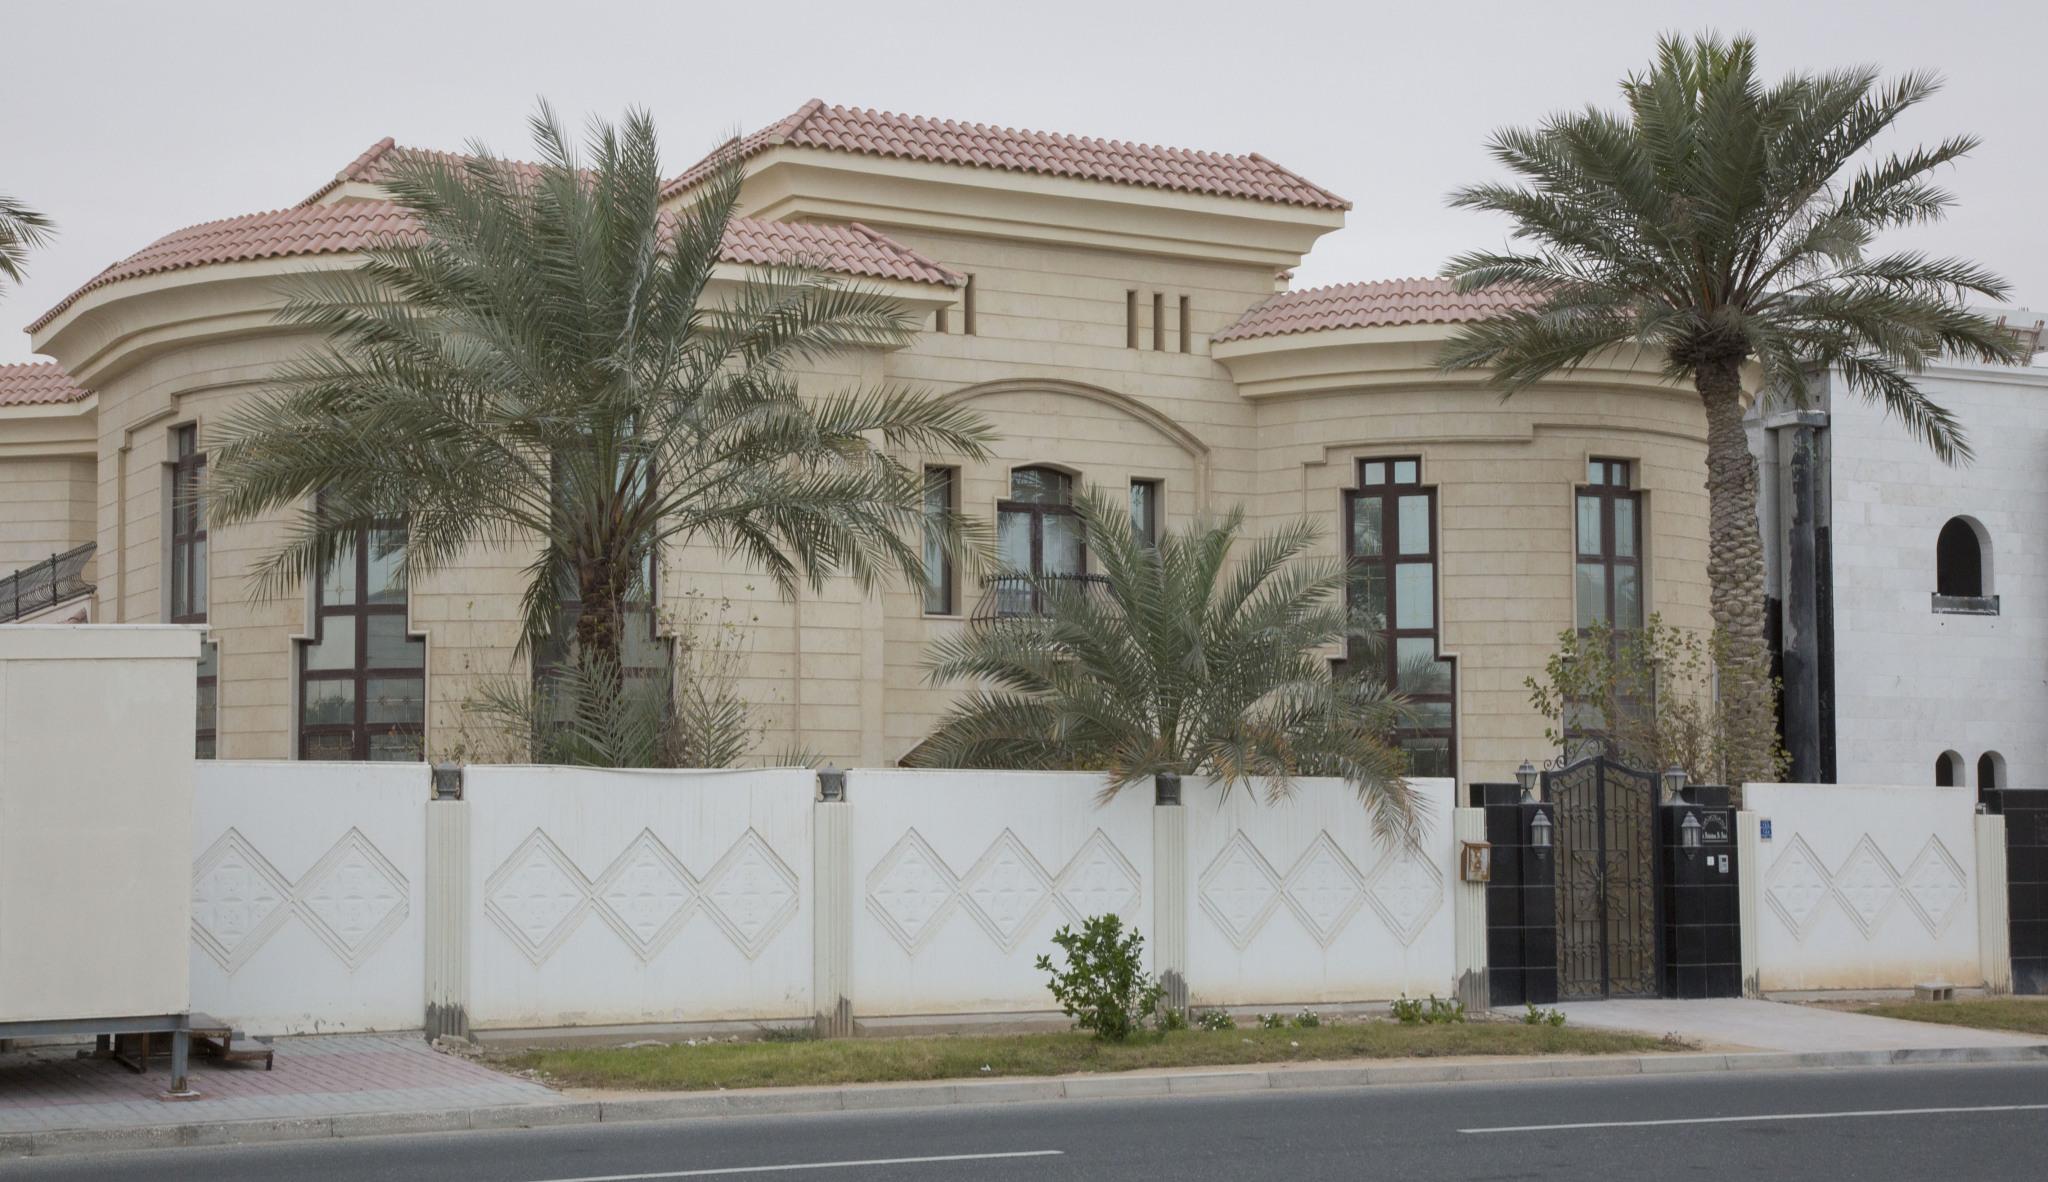 Qatari Home Design Engineering Consultants Qatar | Review ...